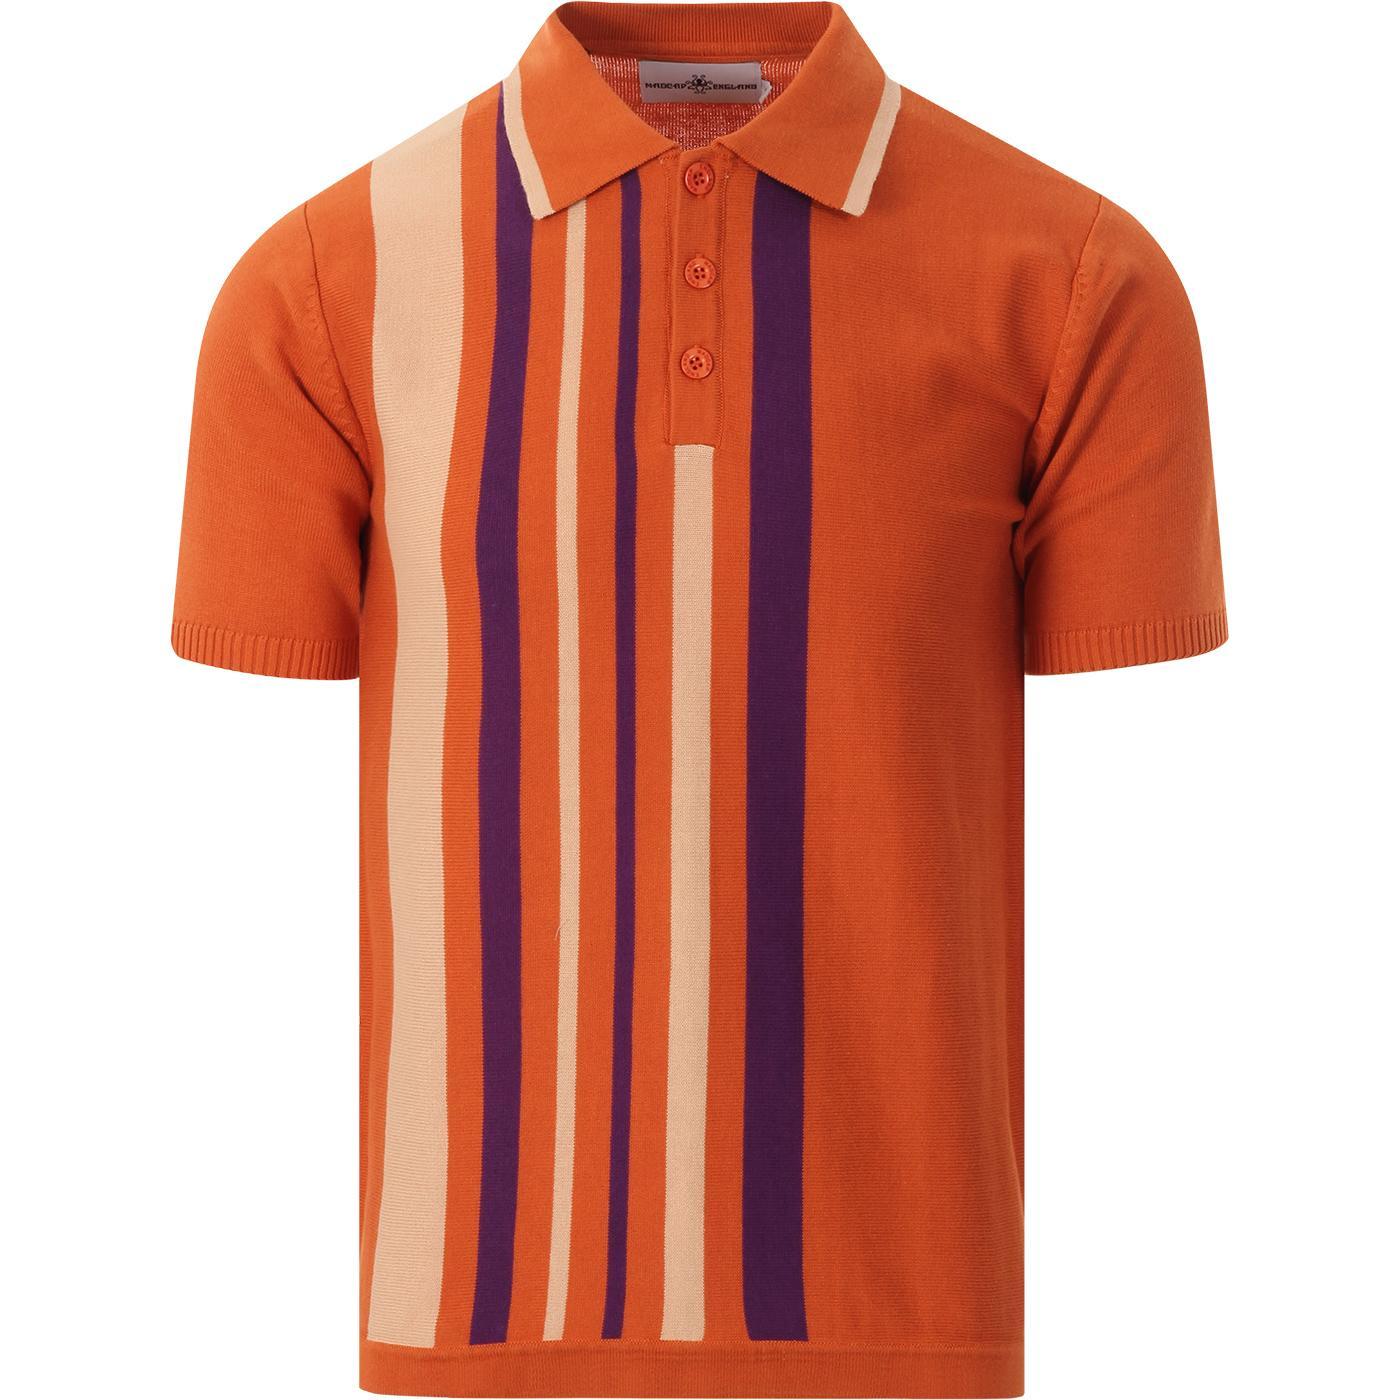 madcap england mens bauhaus side stripes knitted polo tshirt rust purple